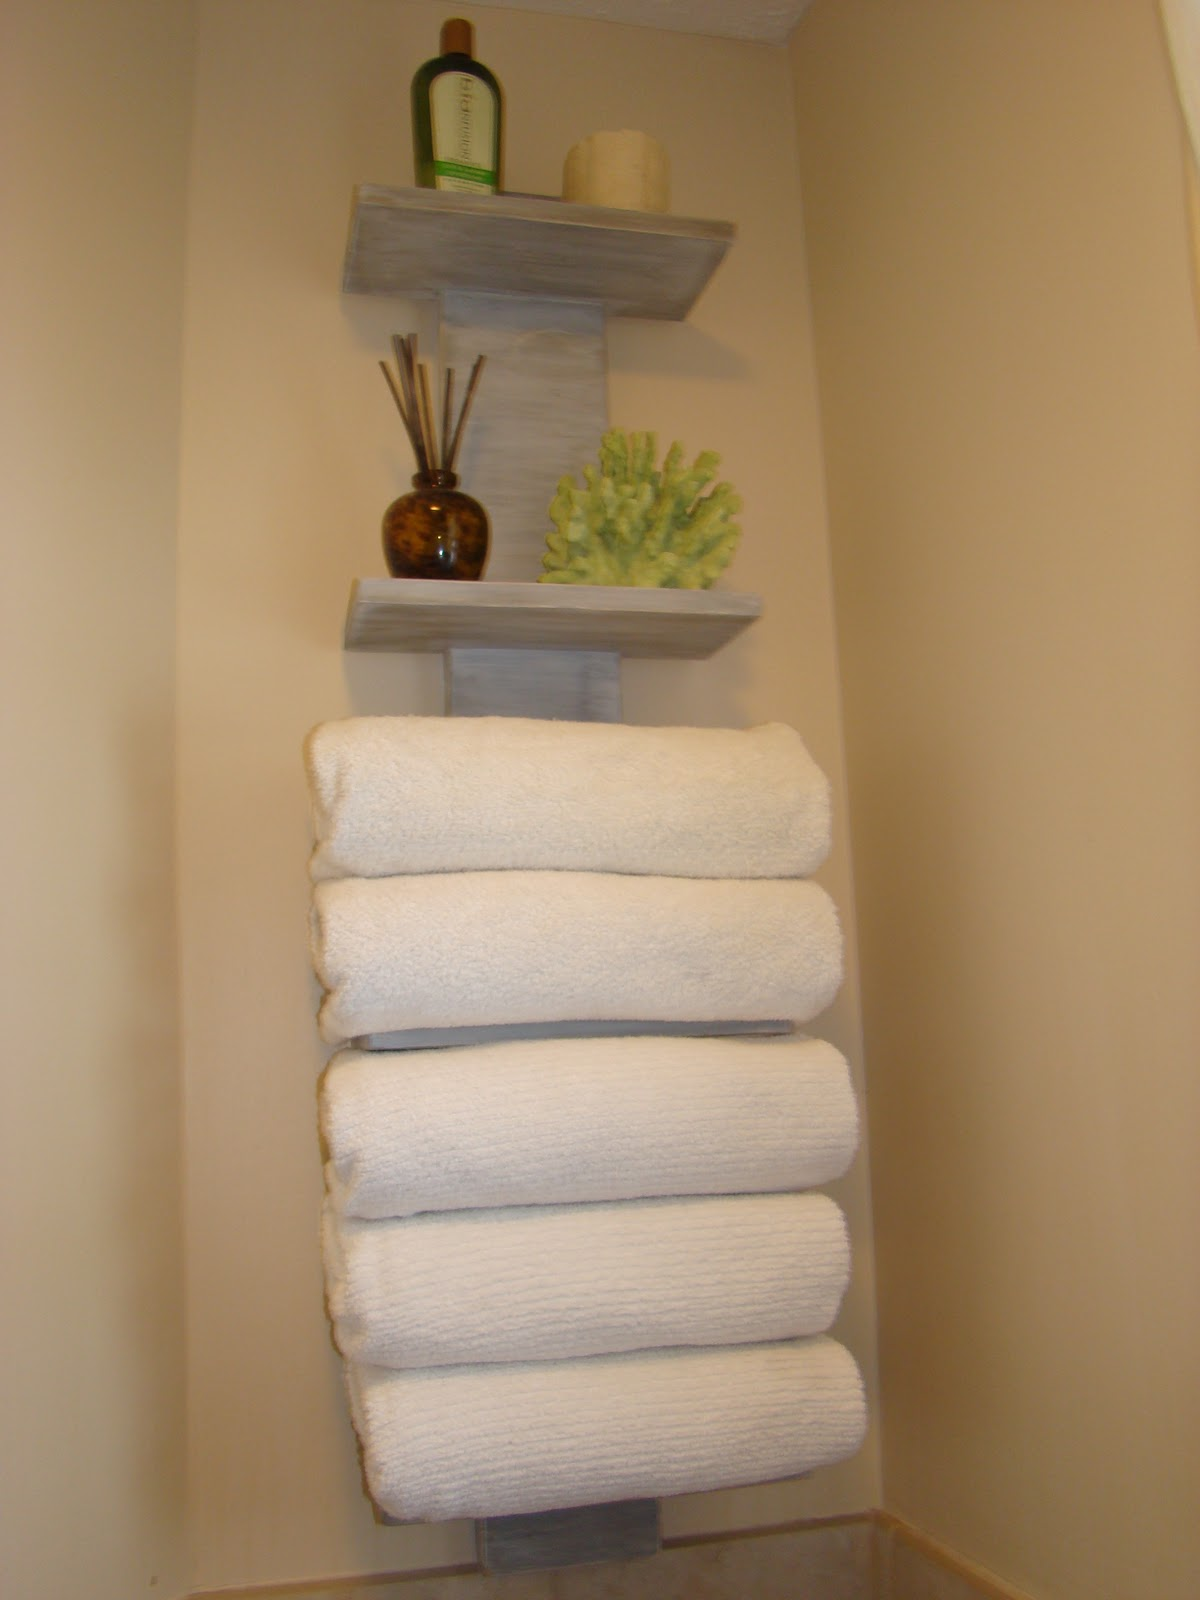 my bath finally gets some towel storage. Black Bedroom Furniture Sets. Home Design Ideas